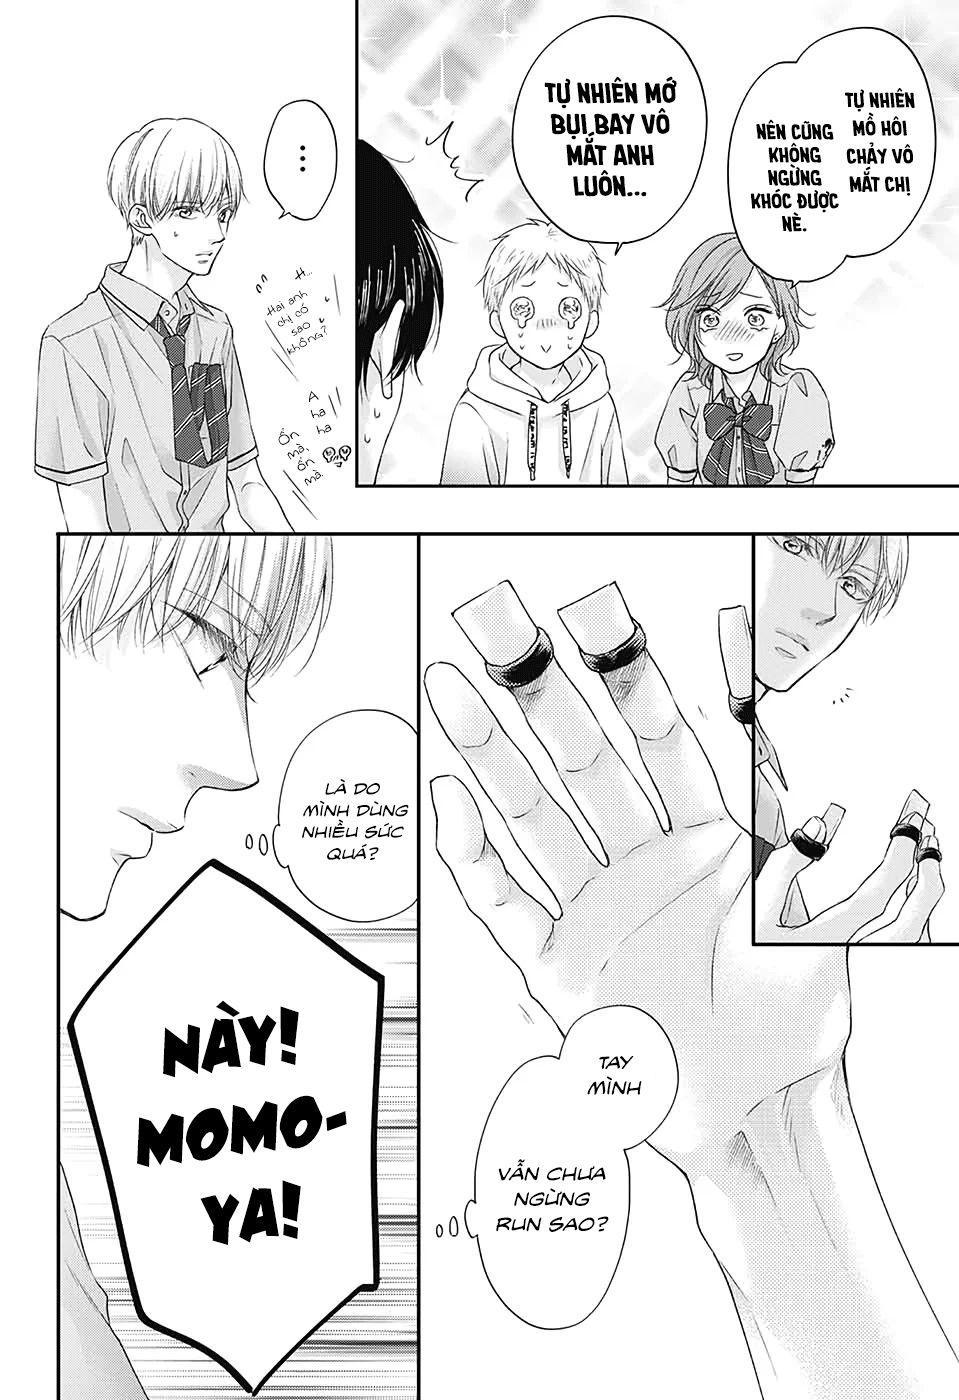 Kono Oto Tomare!: Chapter 97: Em đi nữa